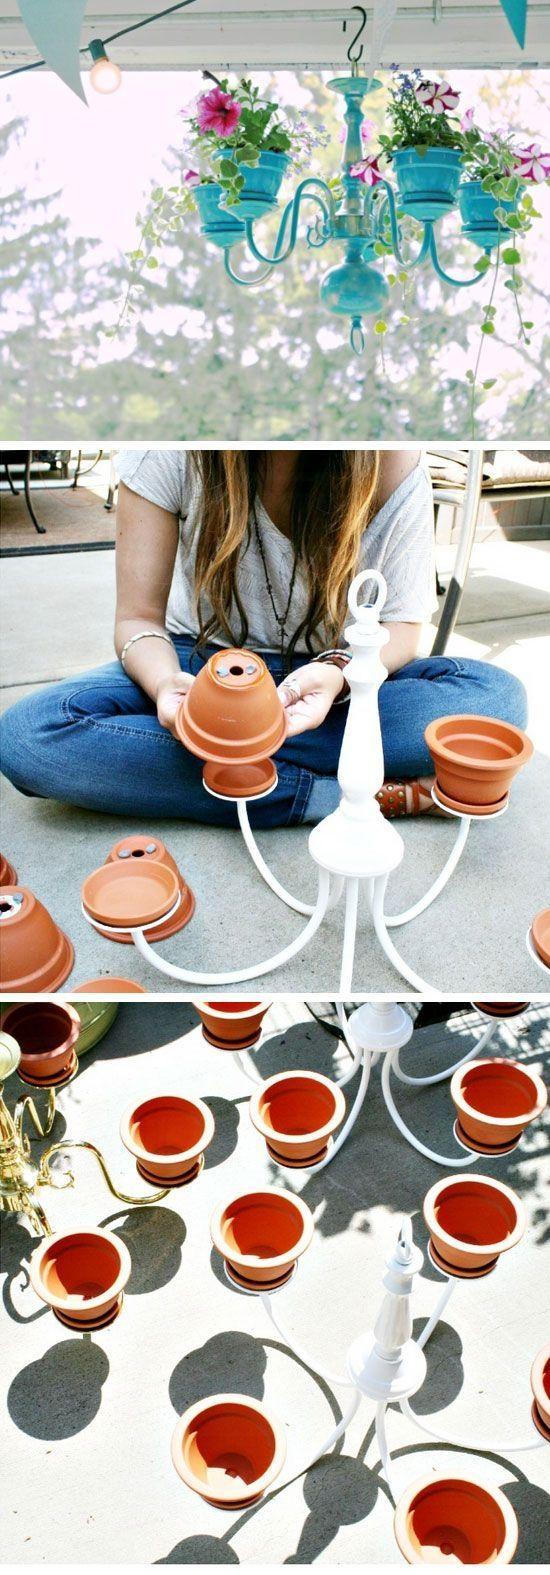 Chandelier Planter Tutorial | DIY Garden Projects Ideas Backyards | DIY Garden Decoartions Budget Backyard by ollie